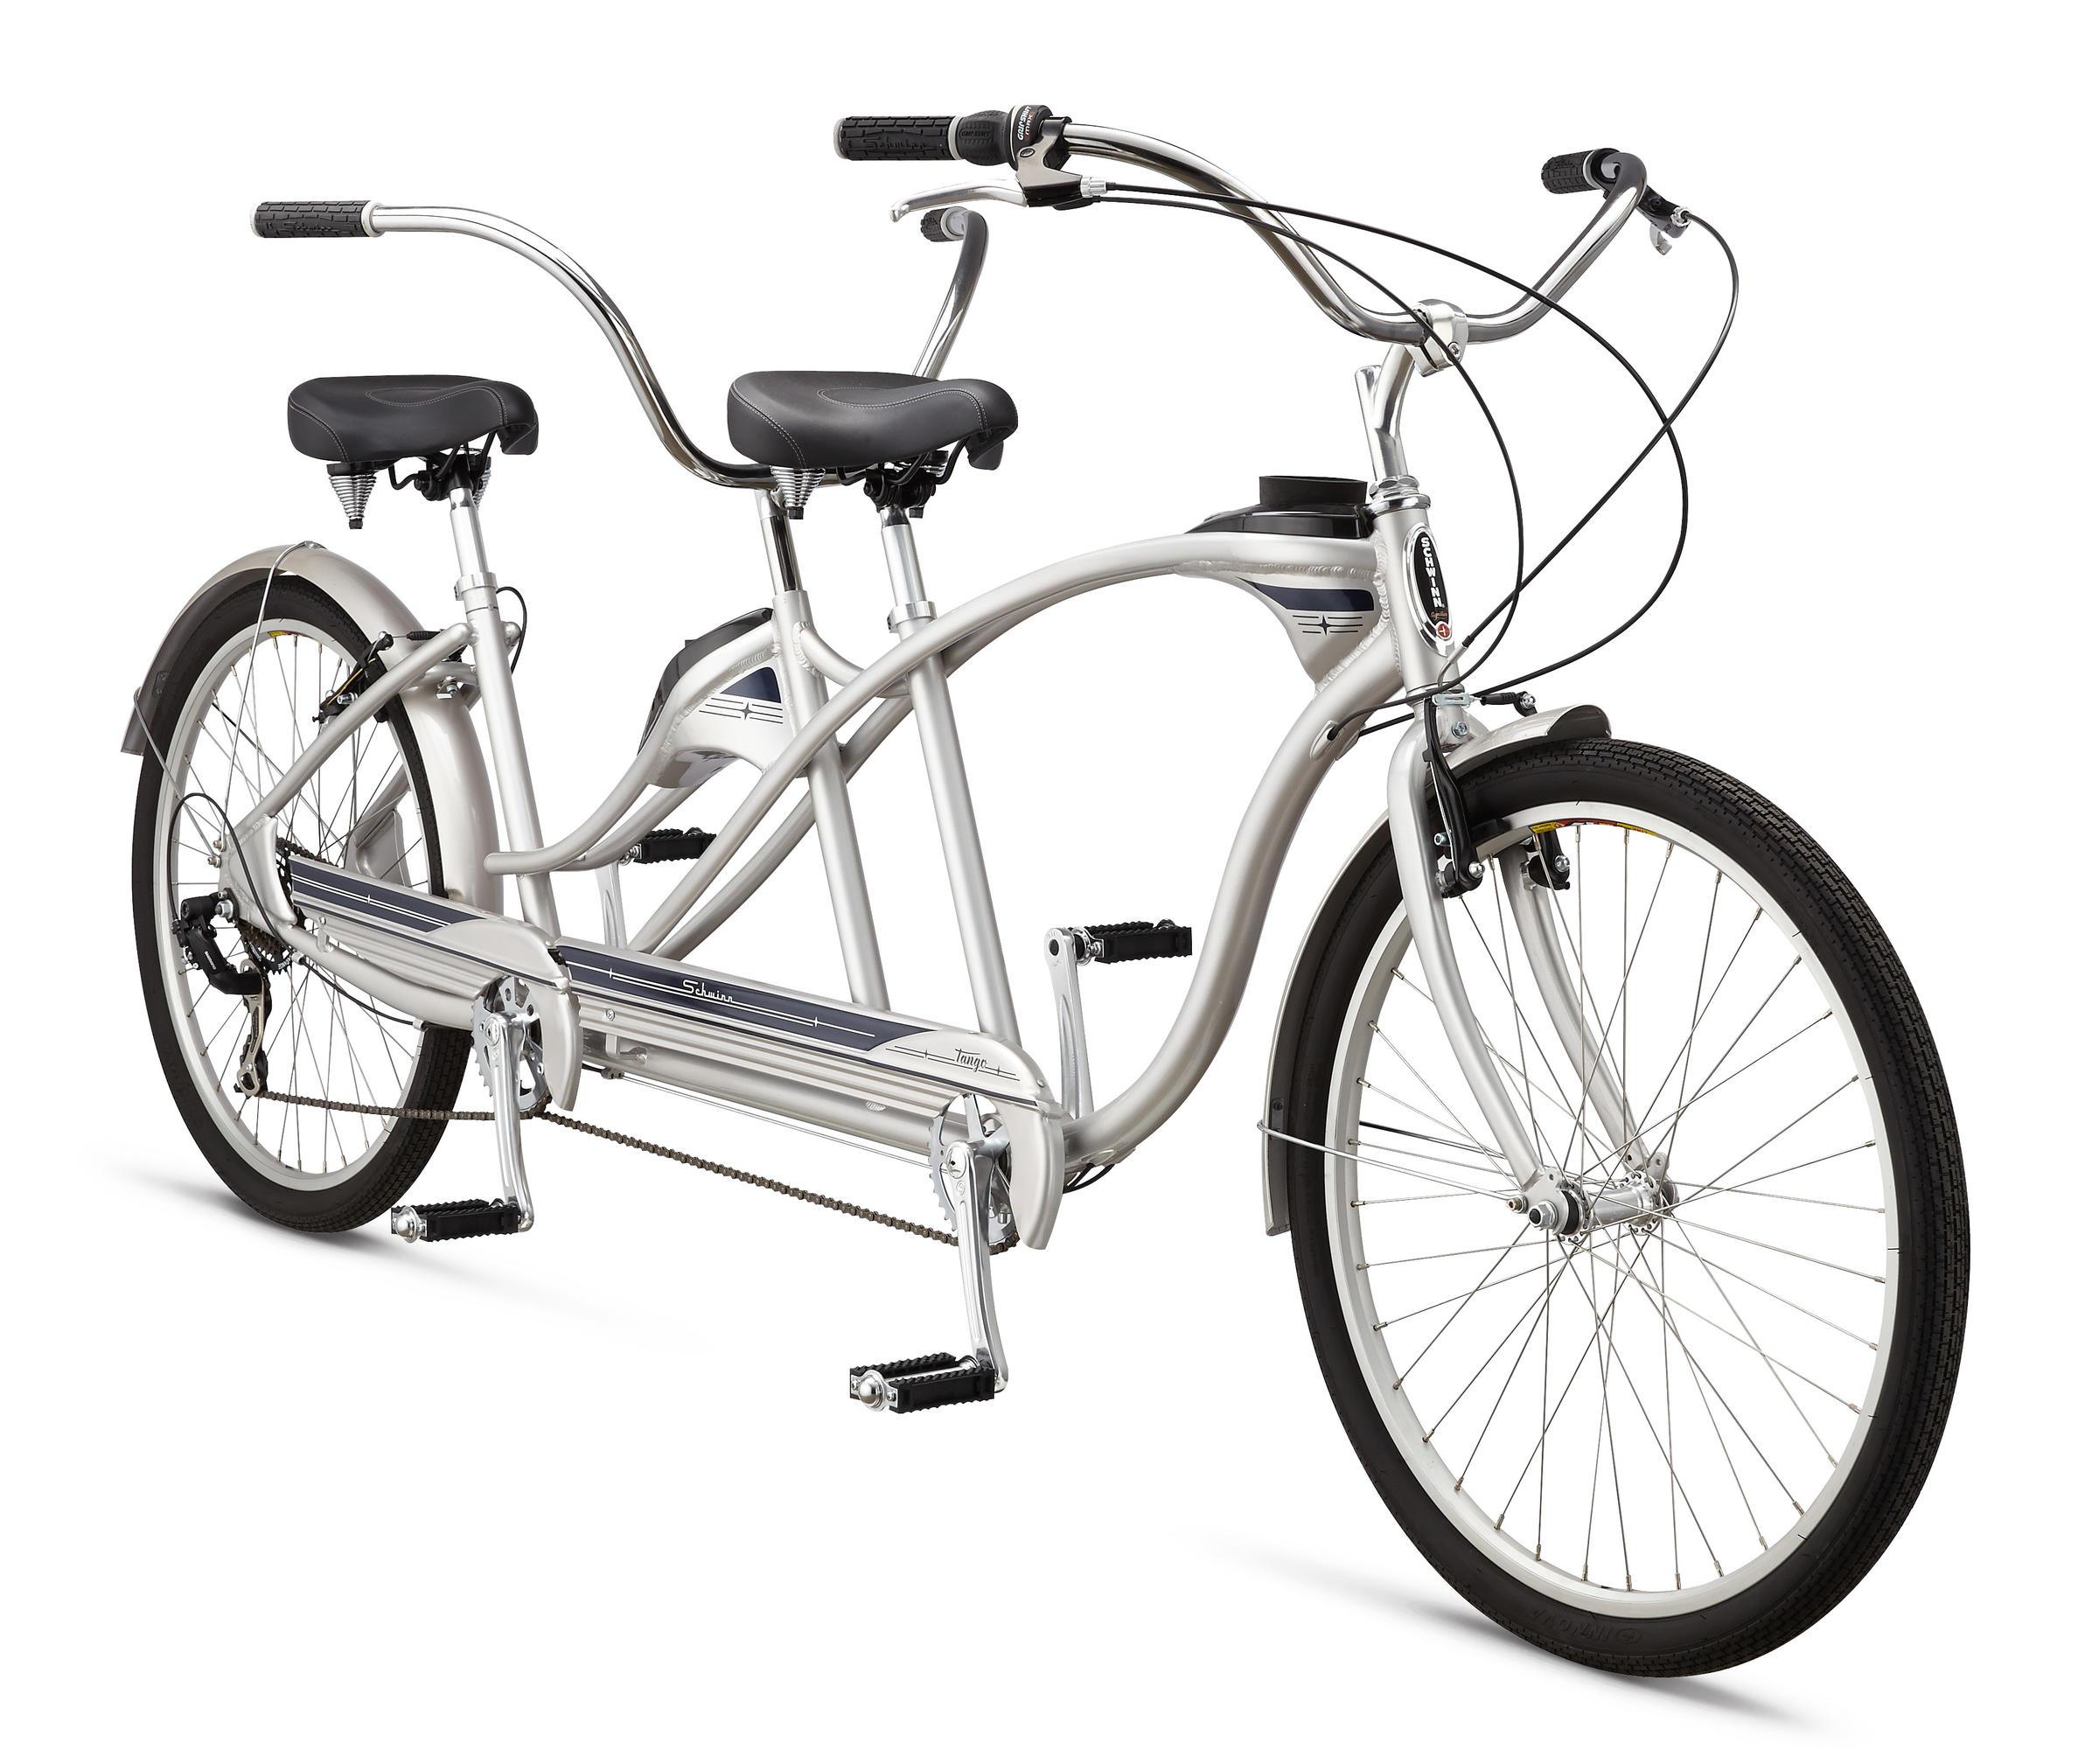 708f591dac4 Schwinn Tango Tandem - Kozy's Chicago Bike Shops | Chicago Bike Stores,  Bicycles, Cycling, Bike Repair